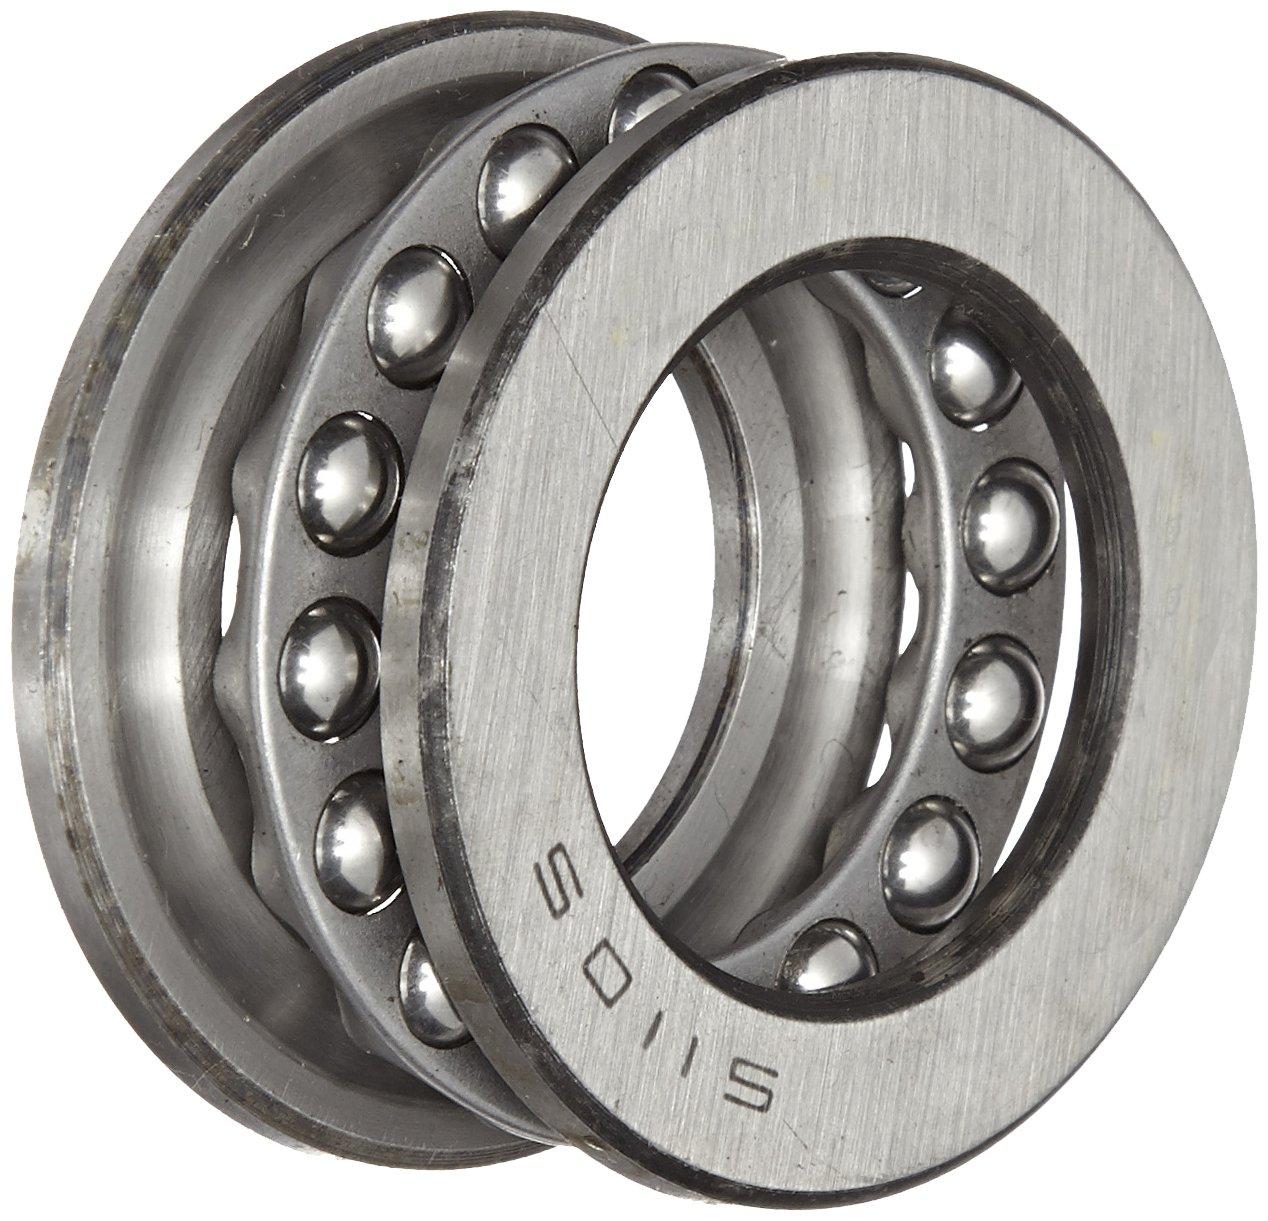 51105 Thrust Bearing 25x42x11 Thrust Bearings VXB